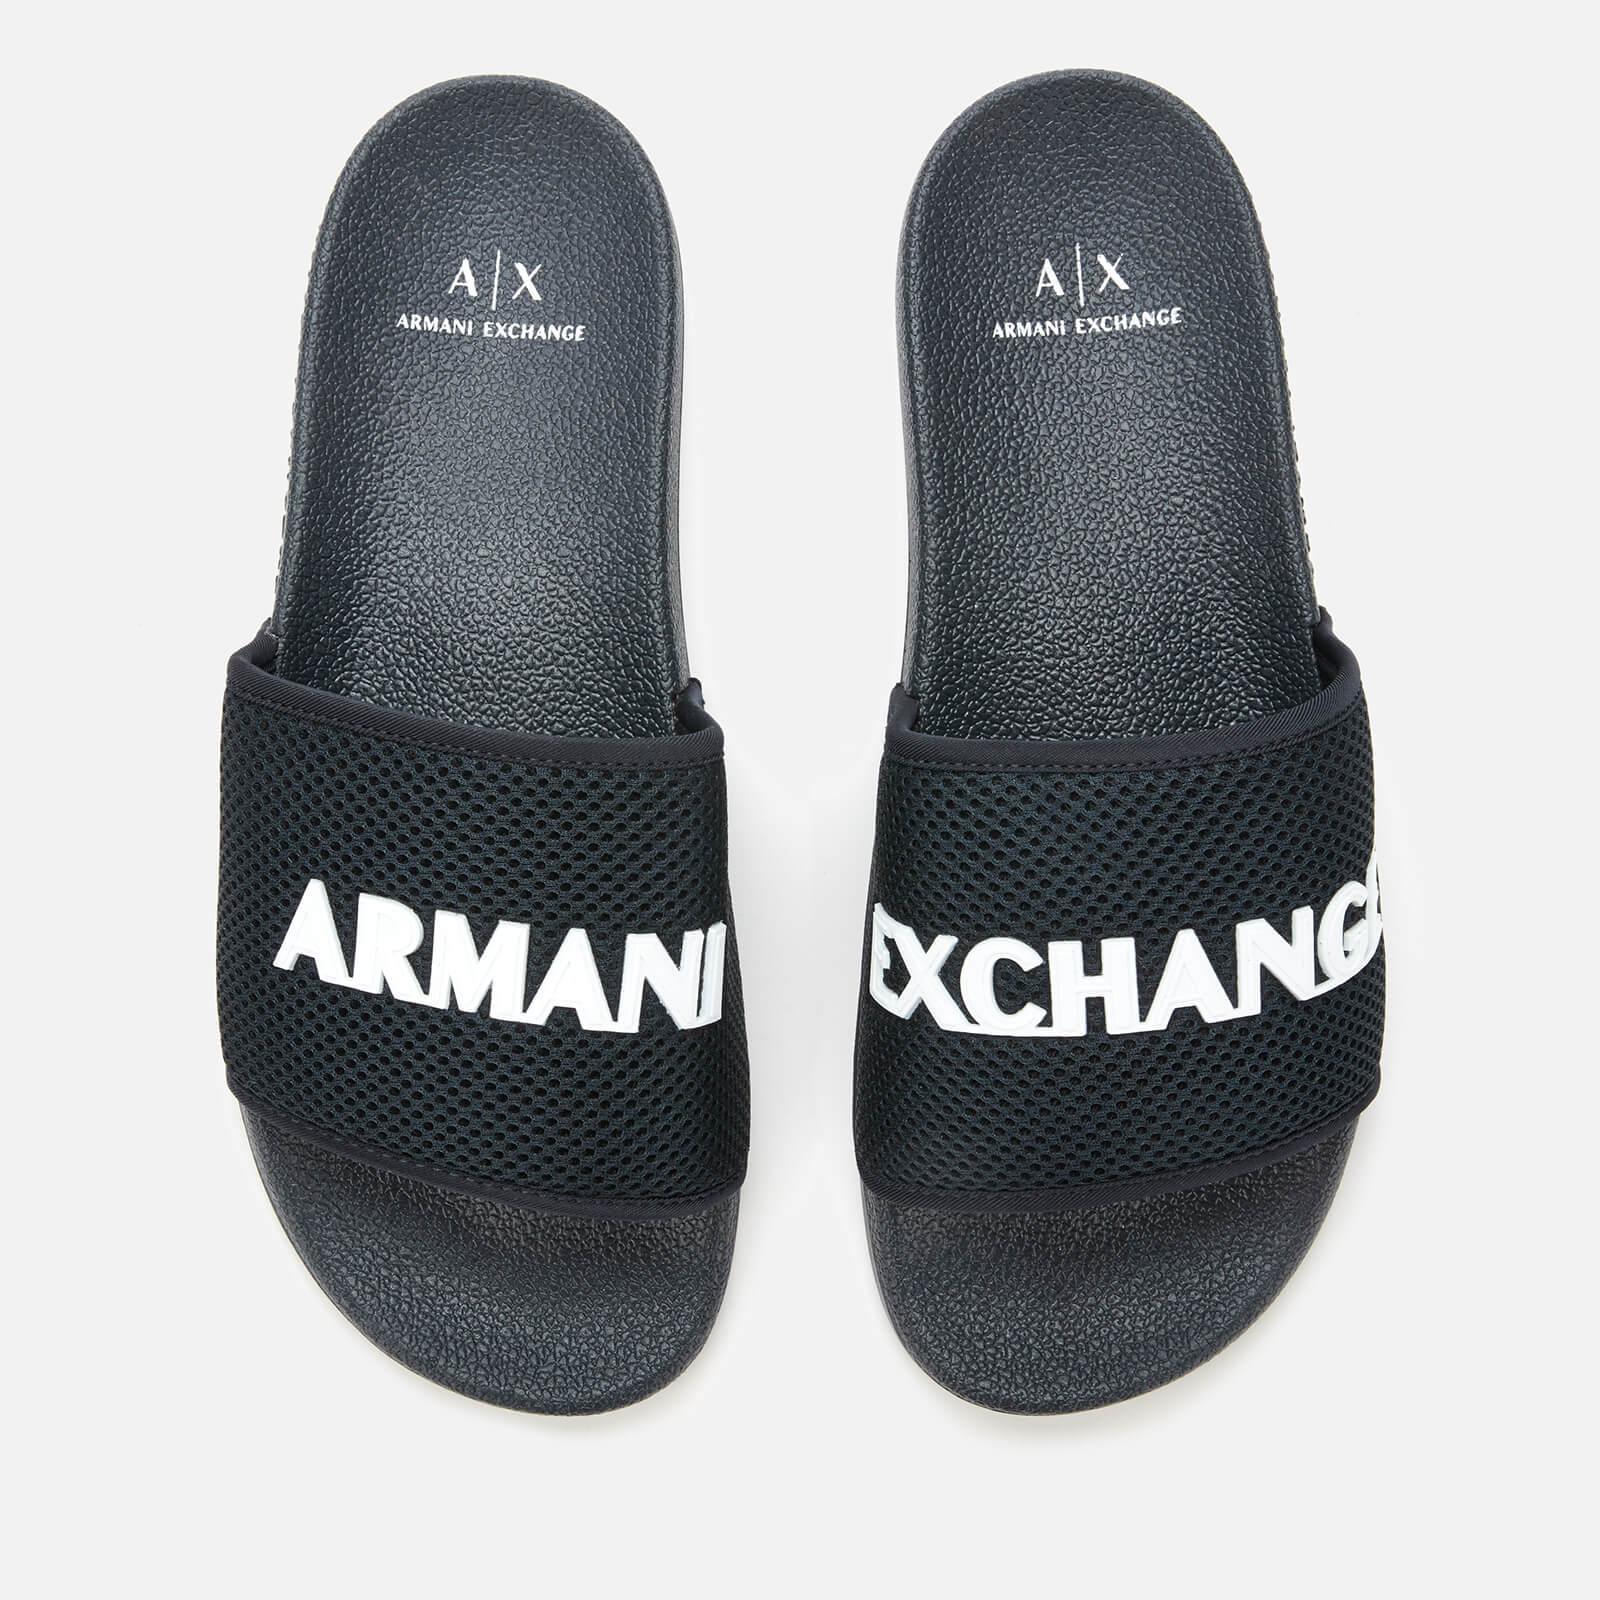 Armani Exchange Men's Slide Sandals - Blue/Optical White - UK 9